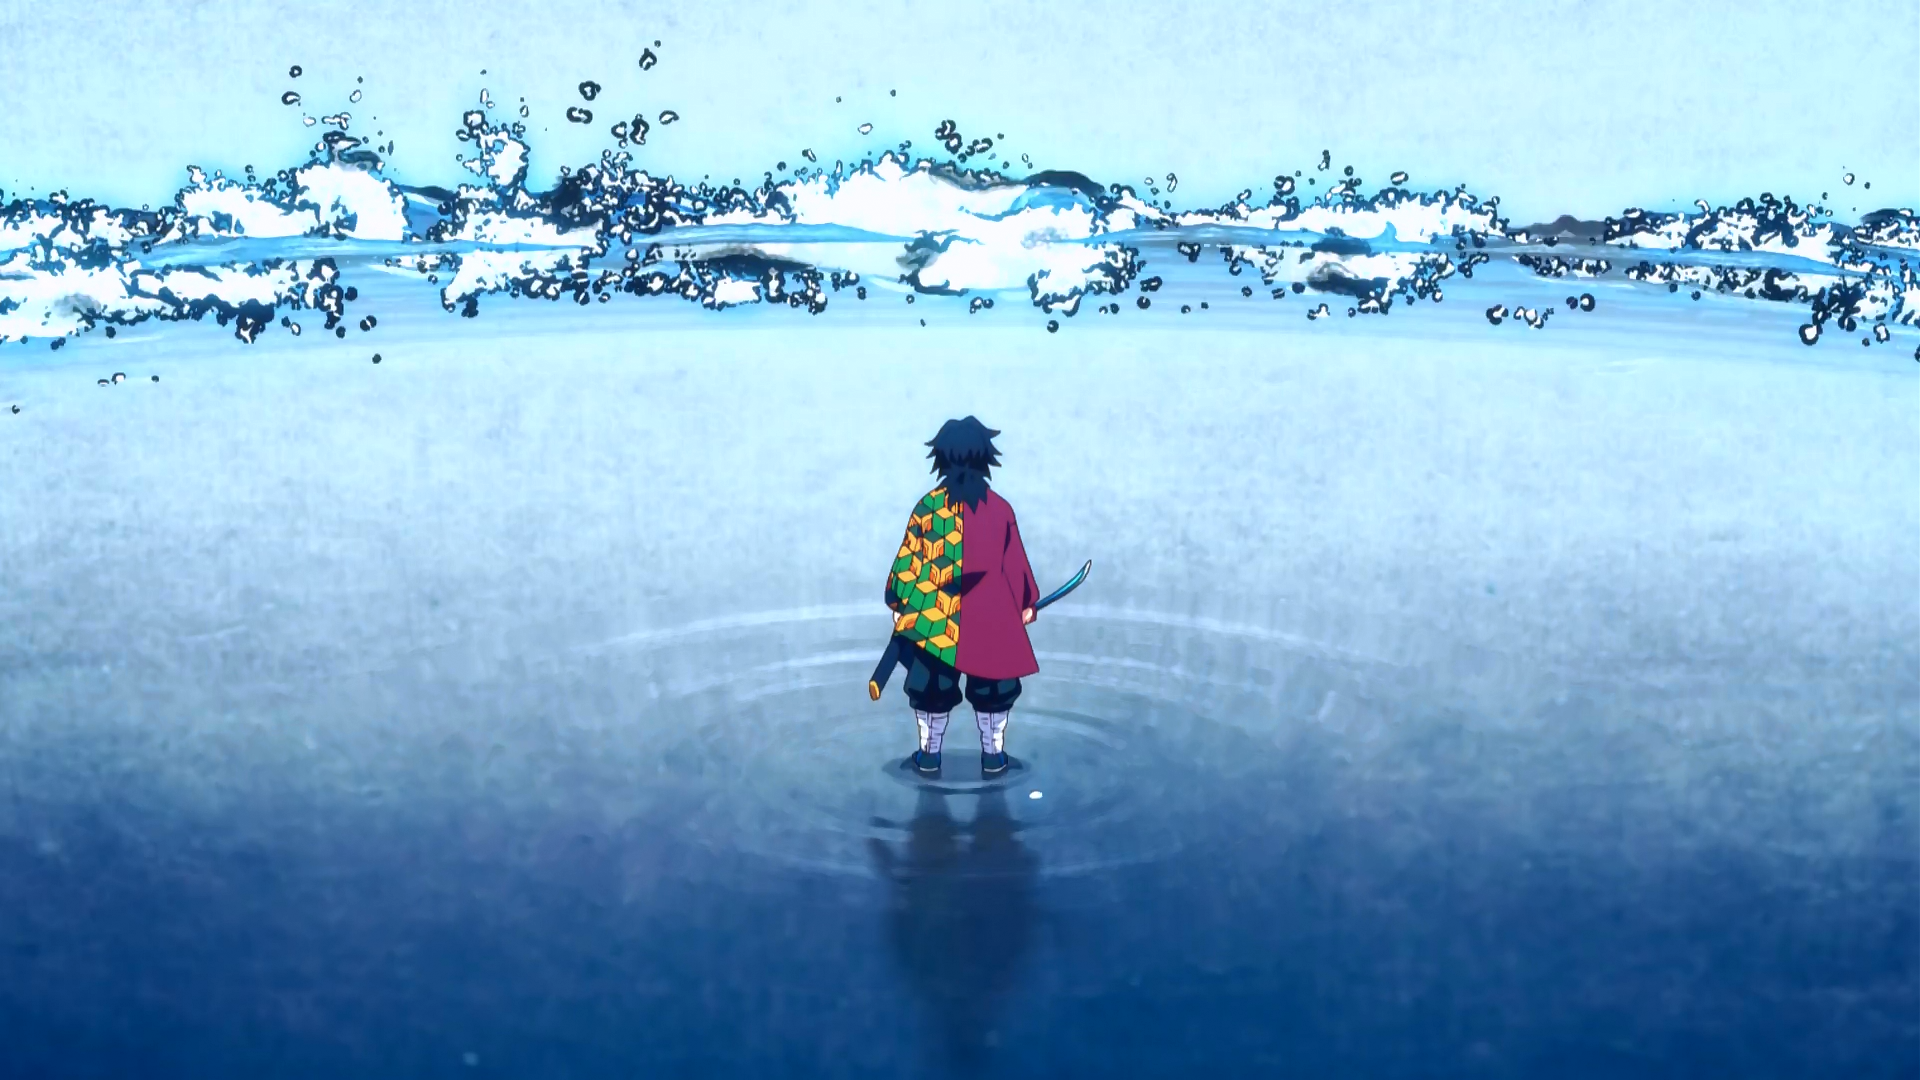 Giyu Tomioka/Image Gallery